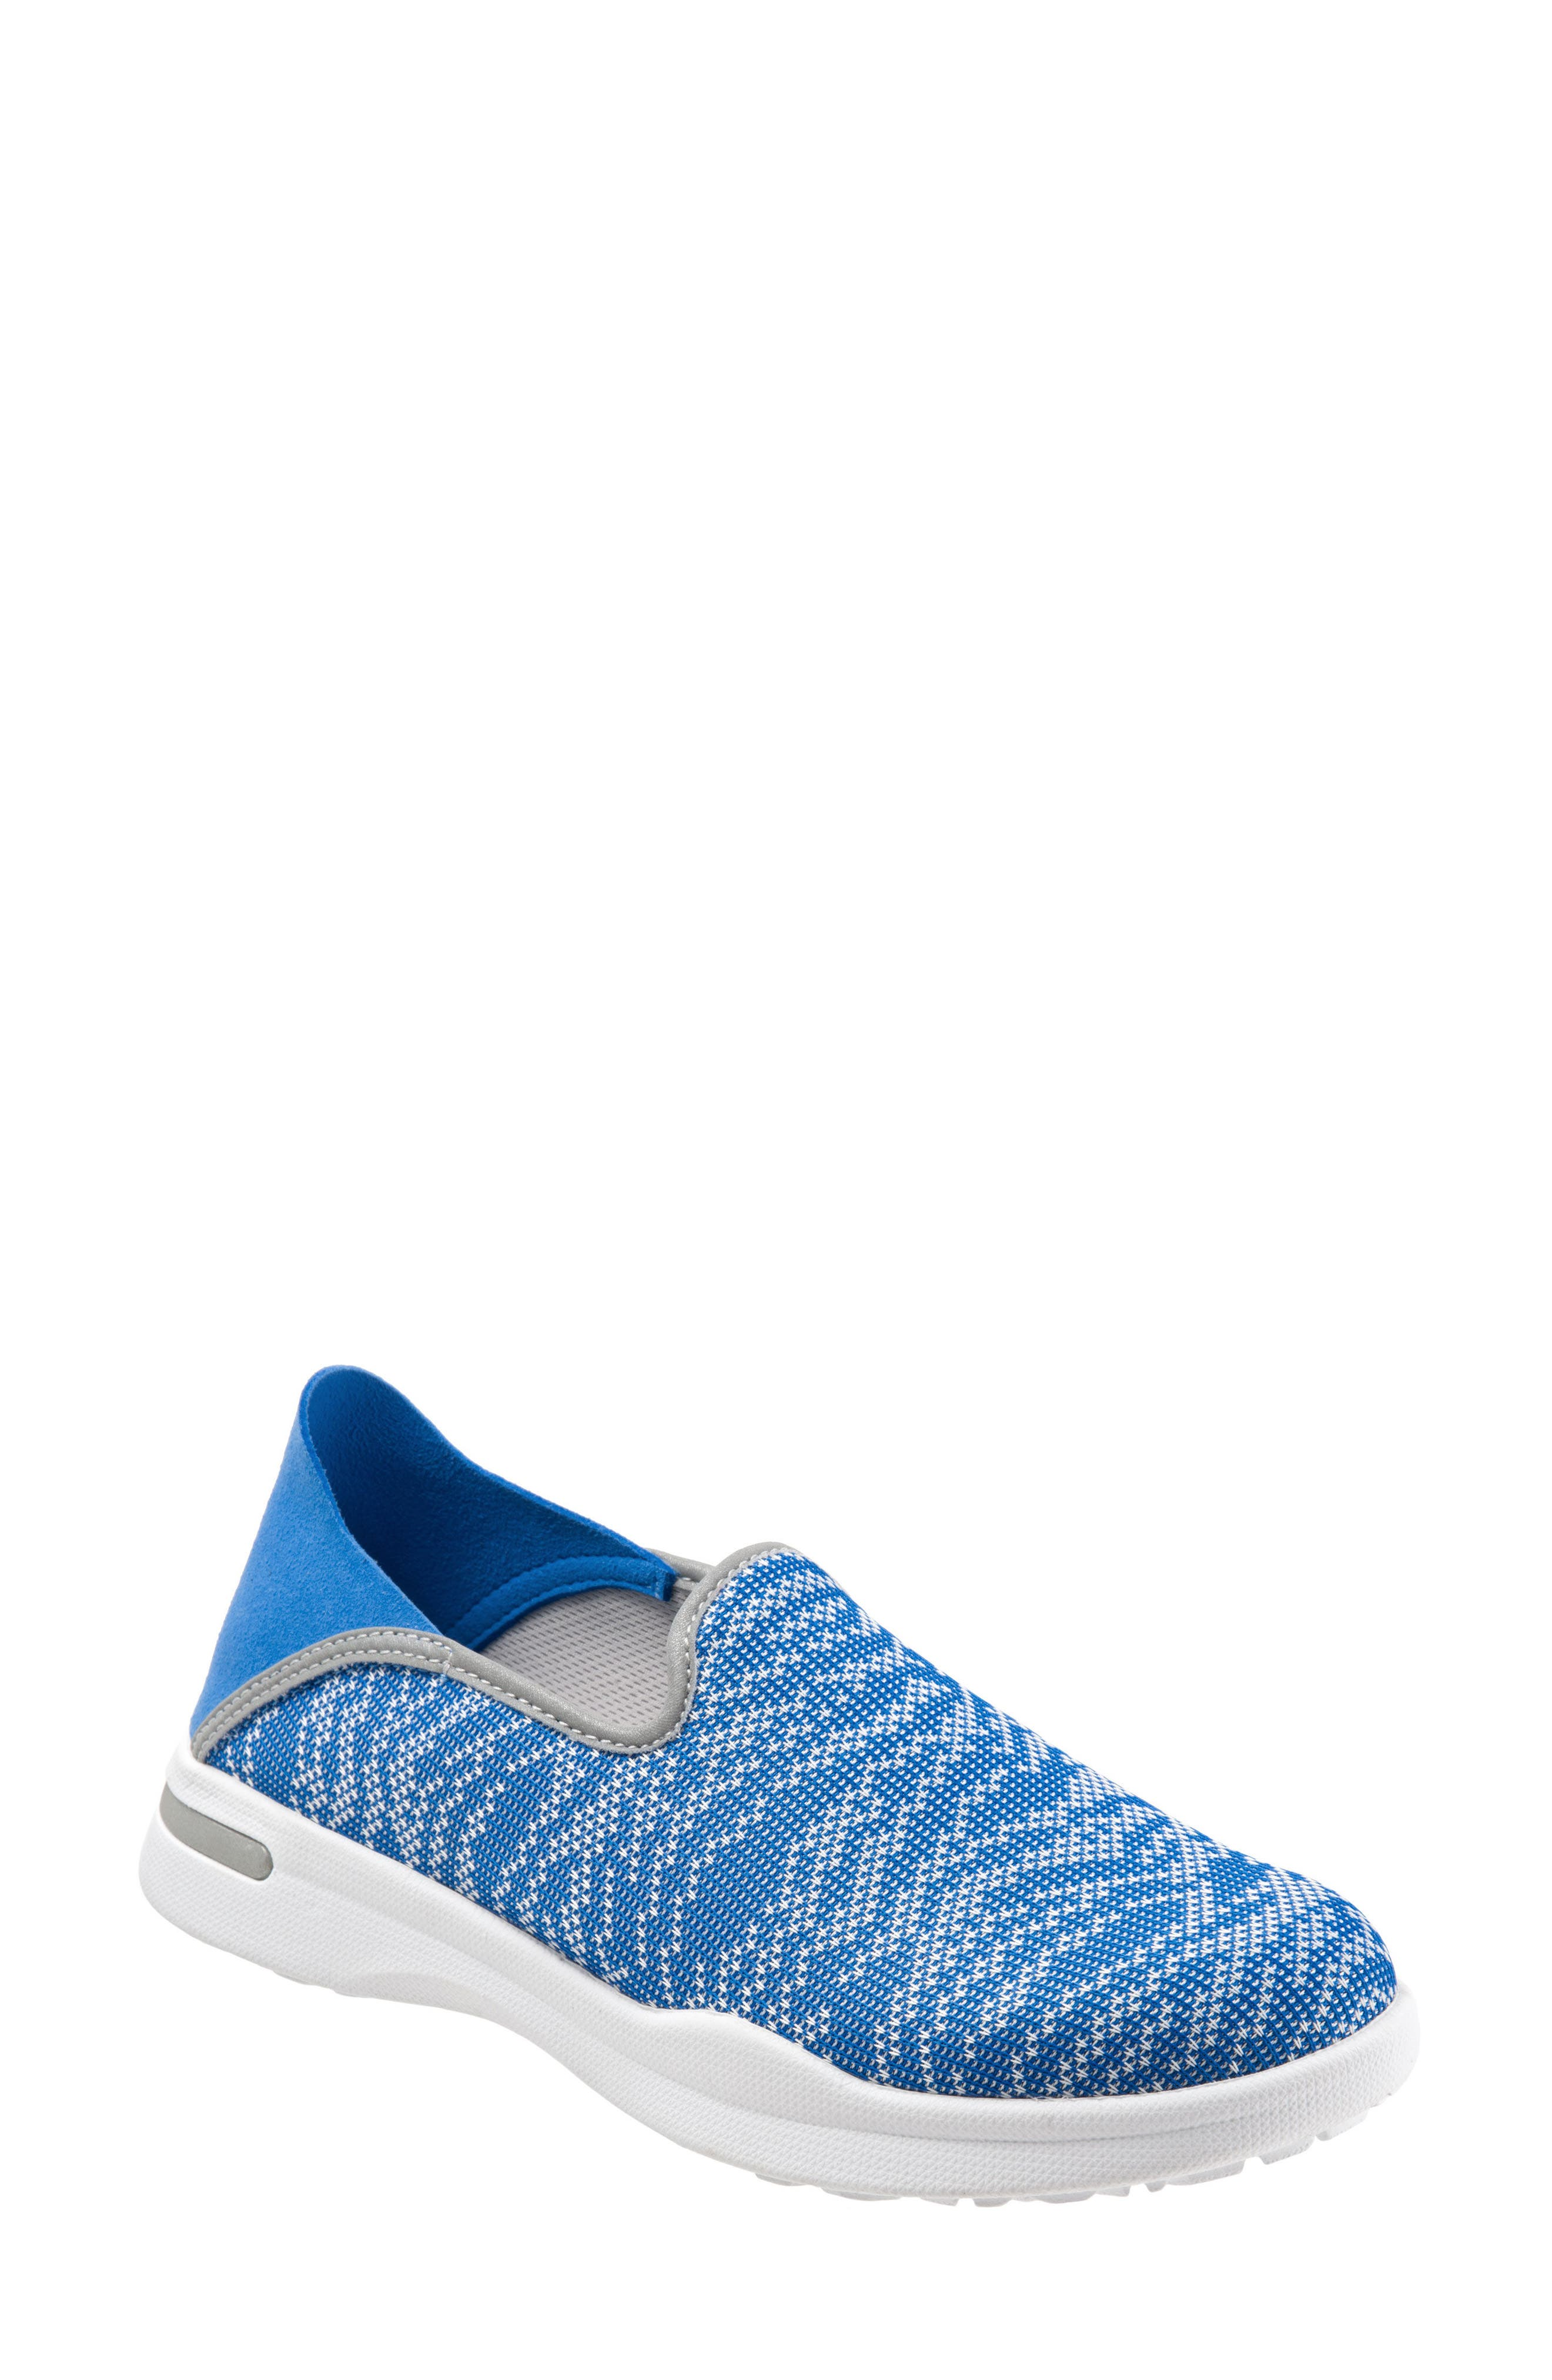 Alternate Image 1 Selected - SoftWalk® Convertible Slip-On Sneaker (Women)